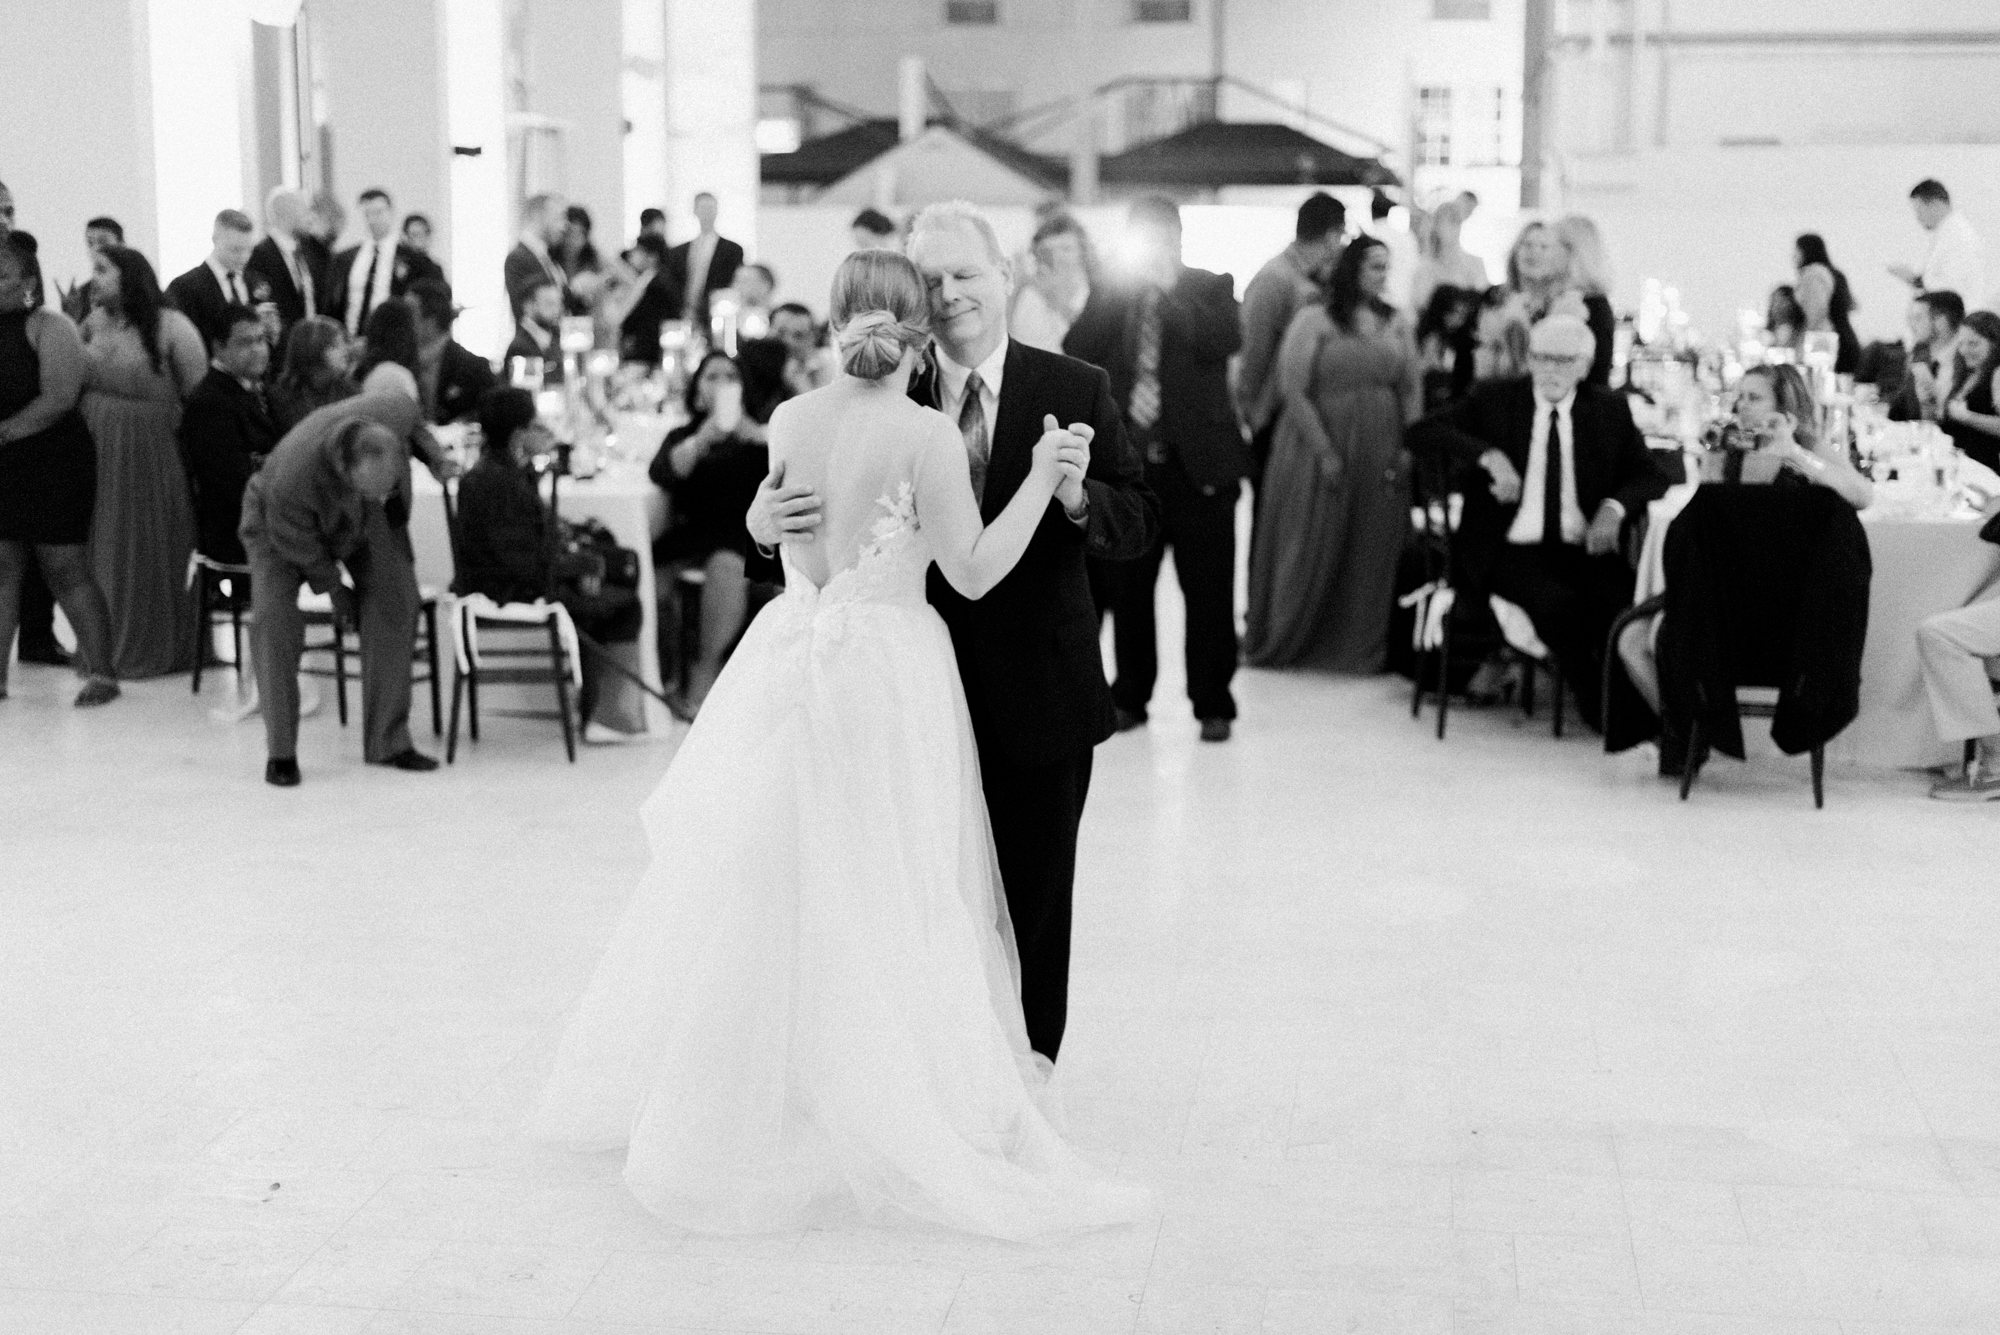 betsy-hotel-wedding-south-beach-miami-charleston-south-carolina-destination-wedding-photographer-34.jpg